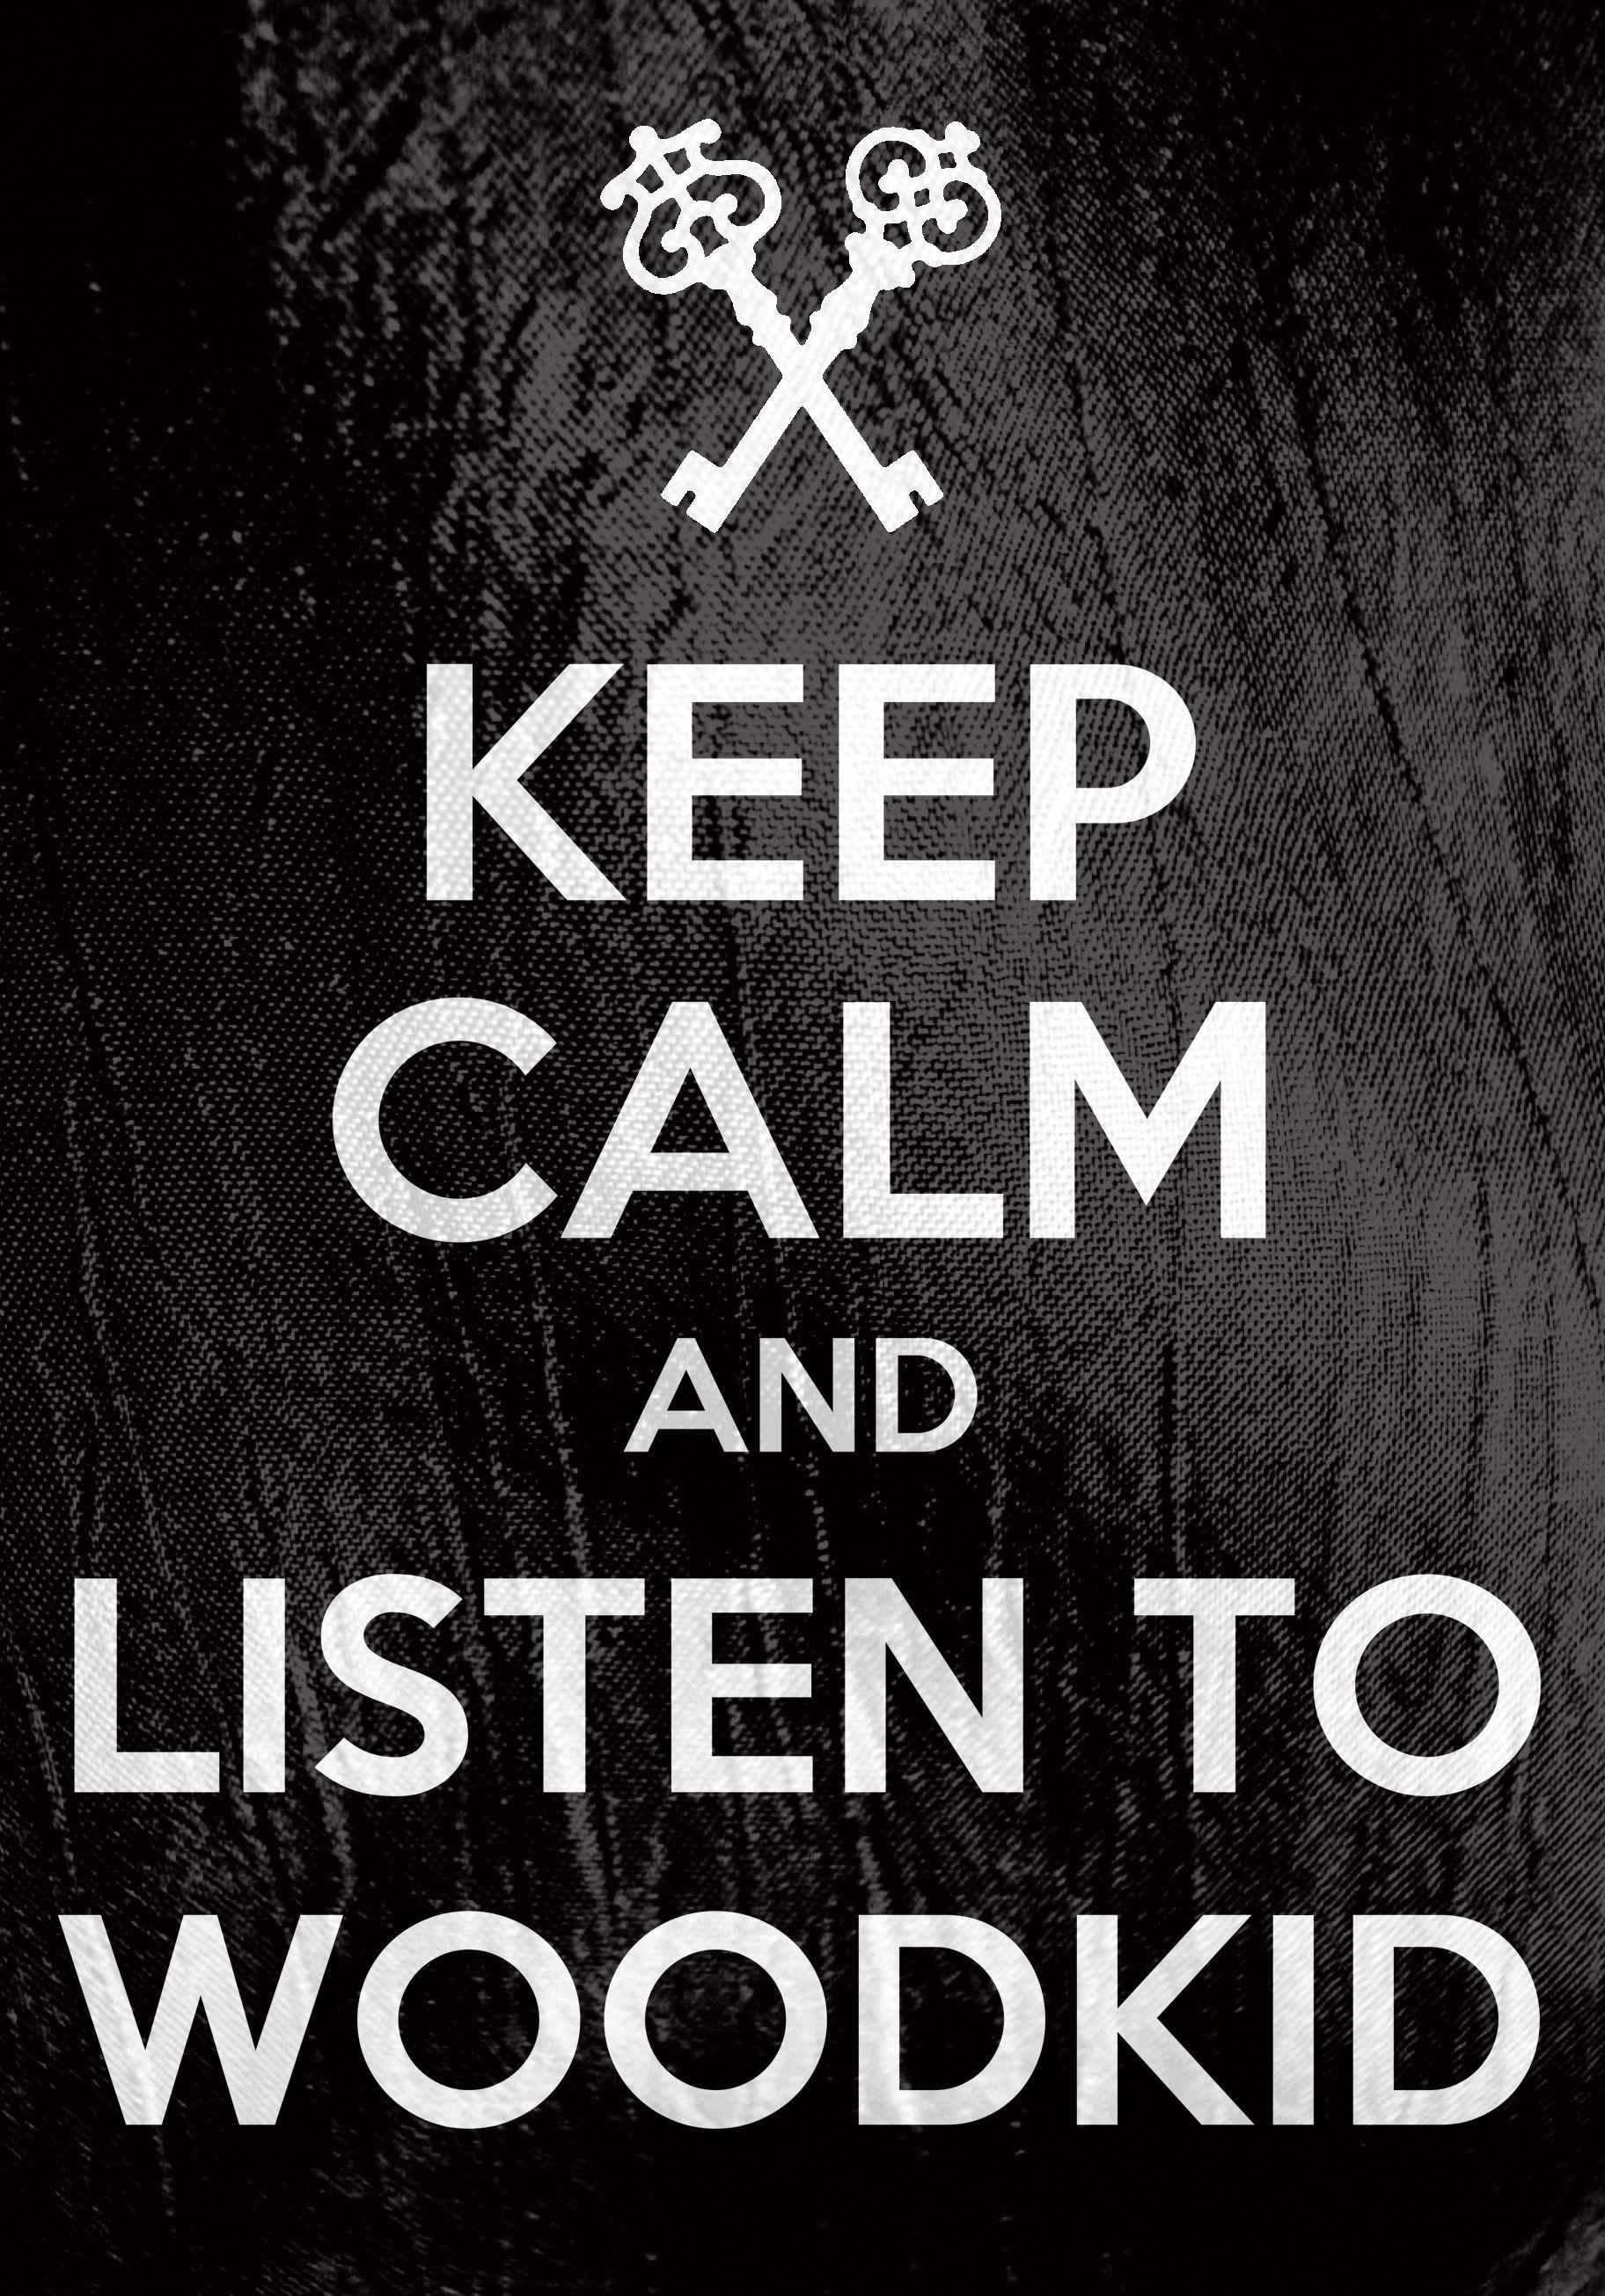 Woodkid | My iArt | Music, Music Videos und Music is my escape